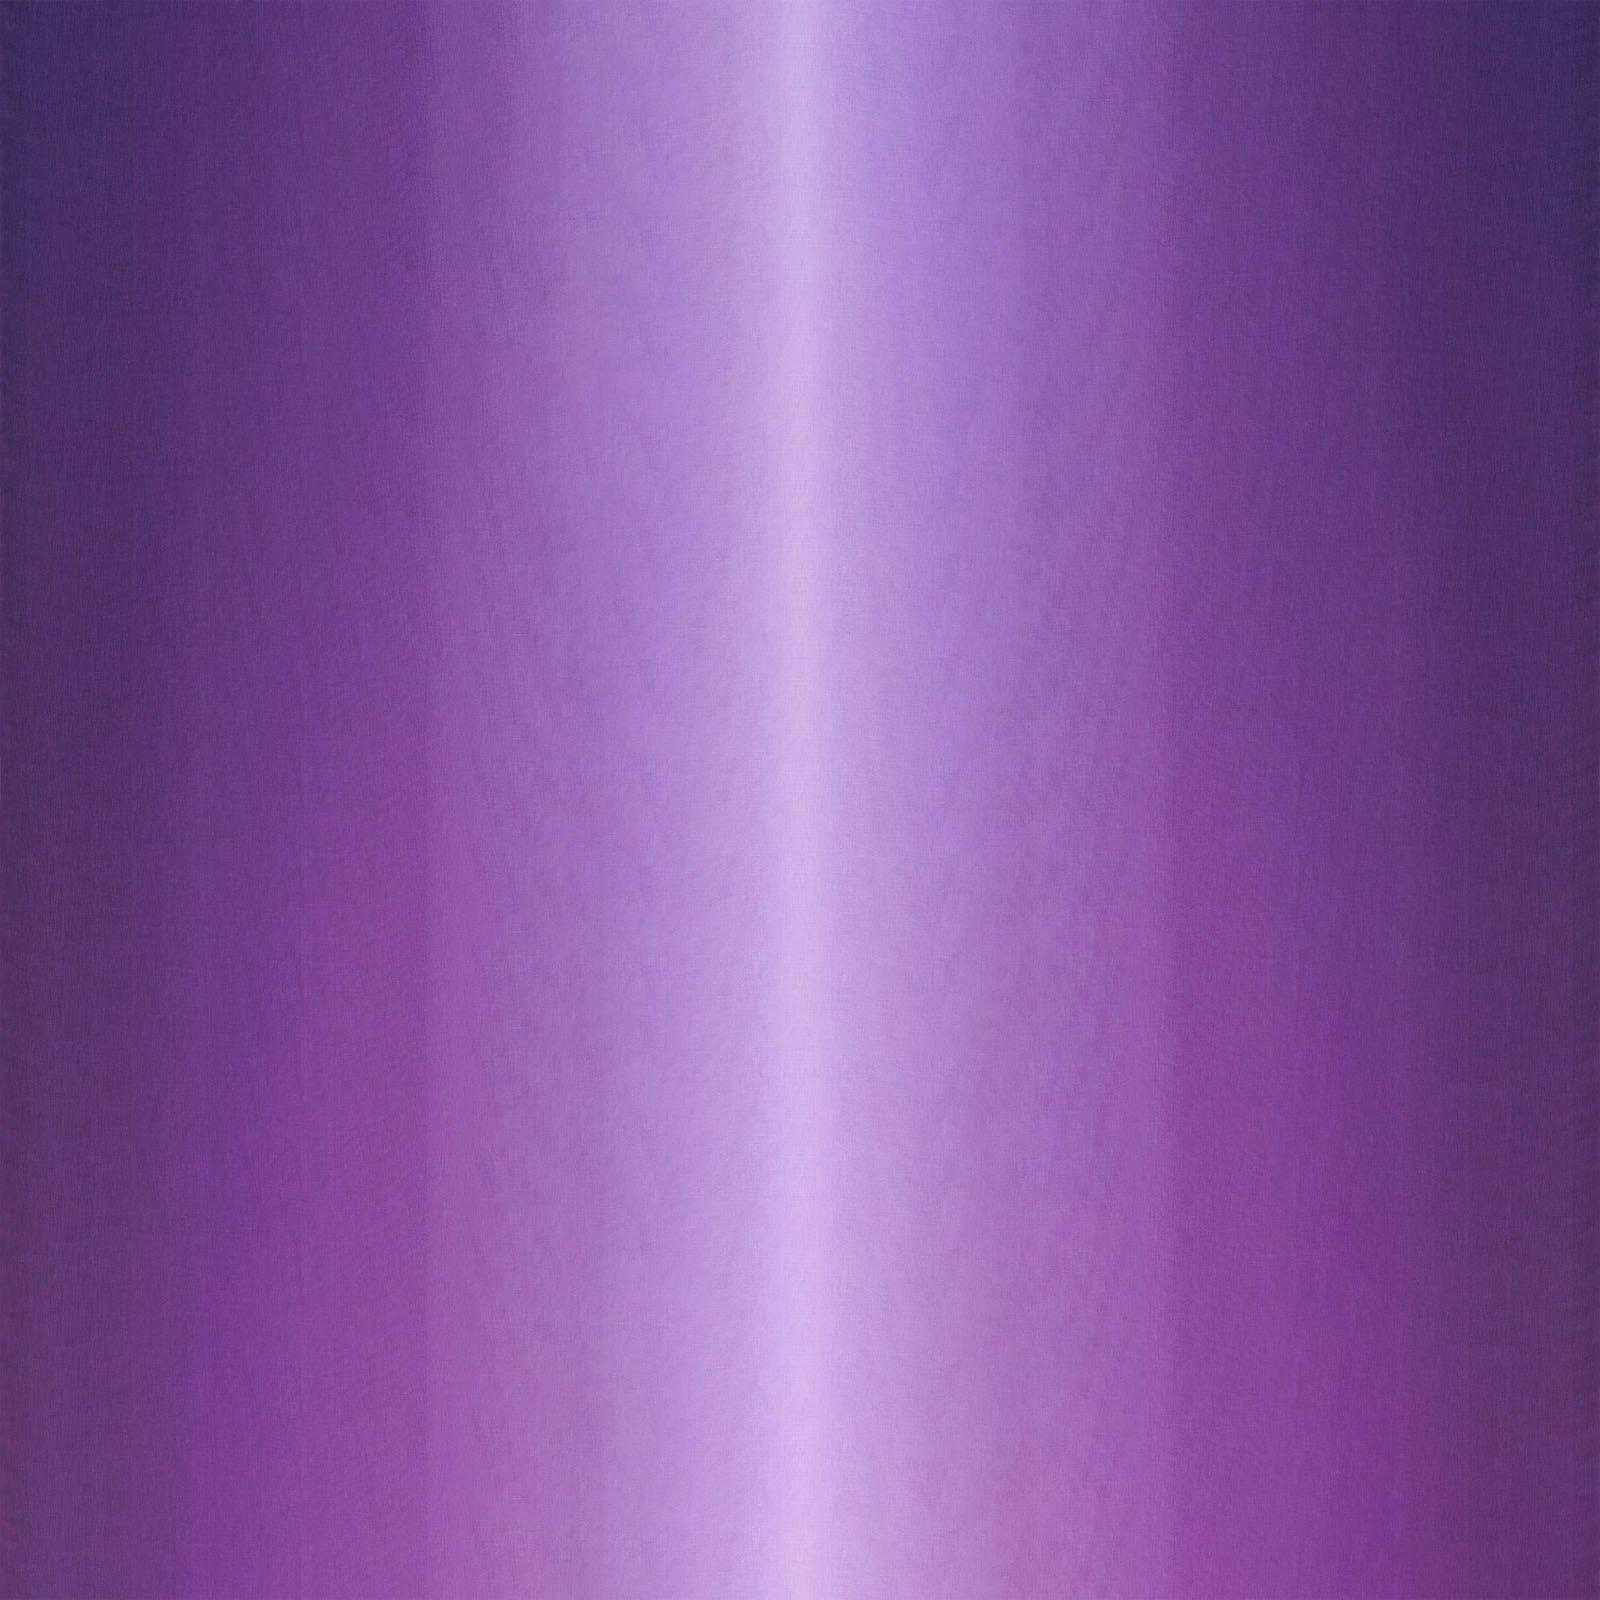 EESC-11216 V3 - GELATO OMBRE BY MAYWOOD PURPLE TONAL